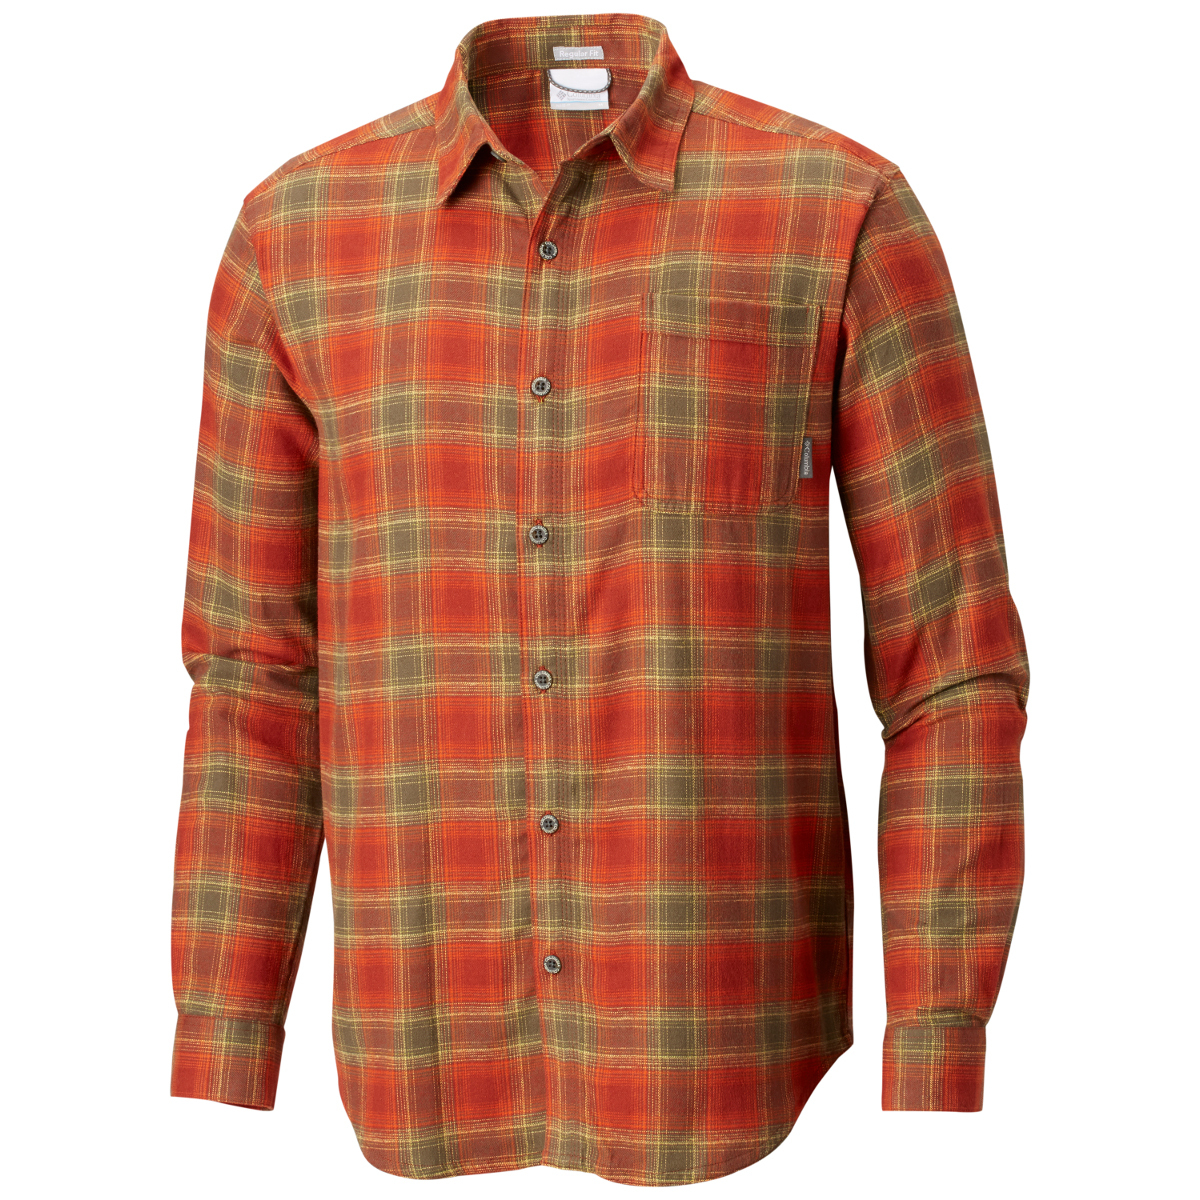 Columbia Men's Boulder Ridge Long-Sleeve Flannel Shirt - Red, M